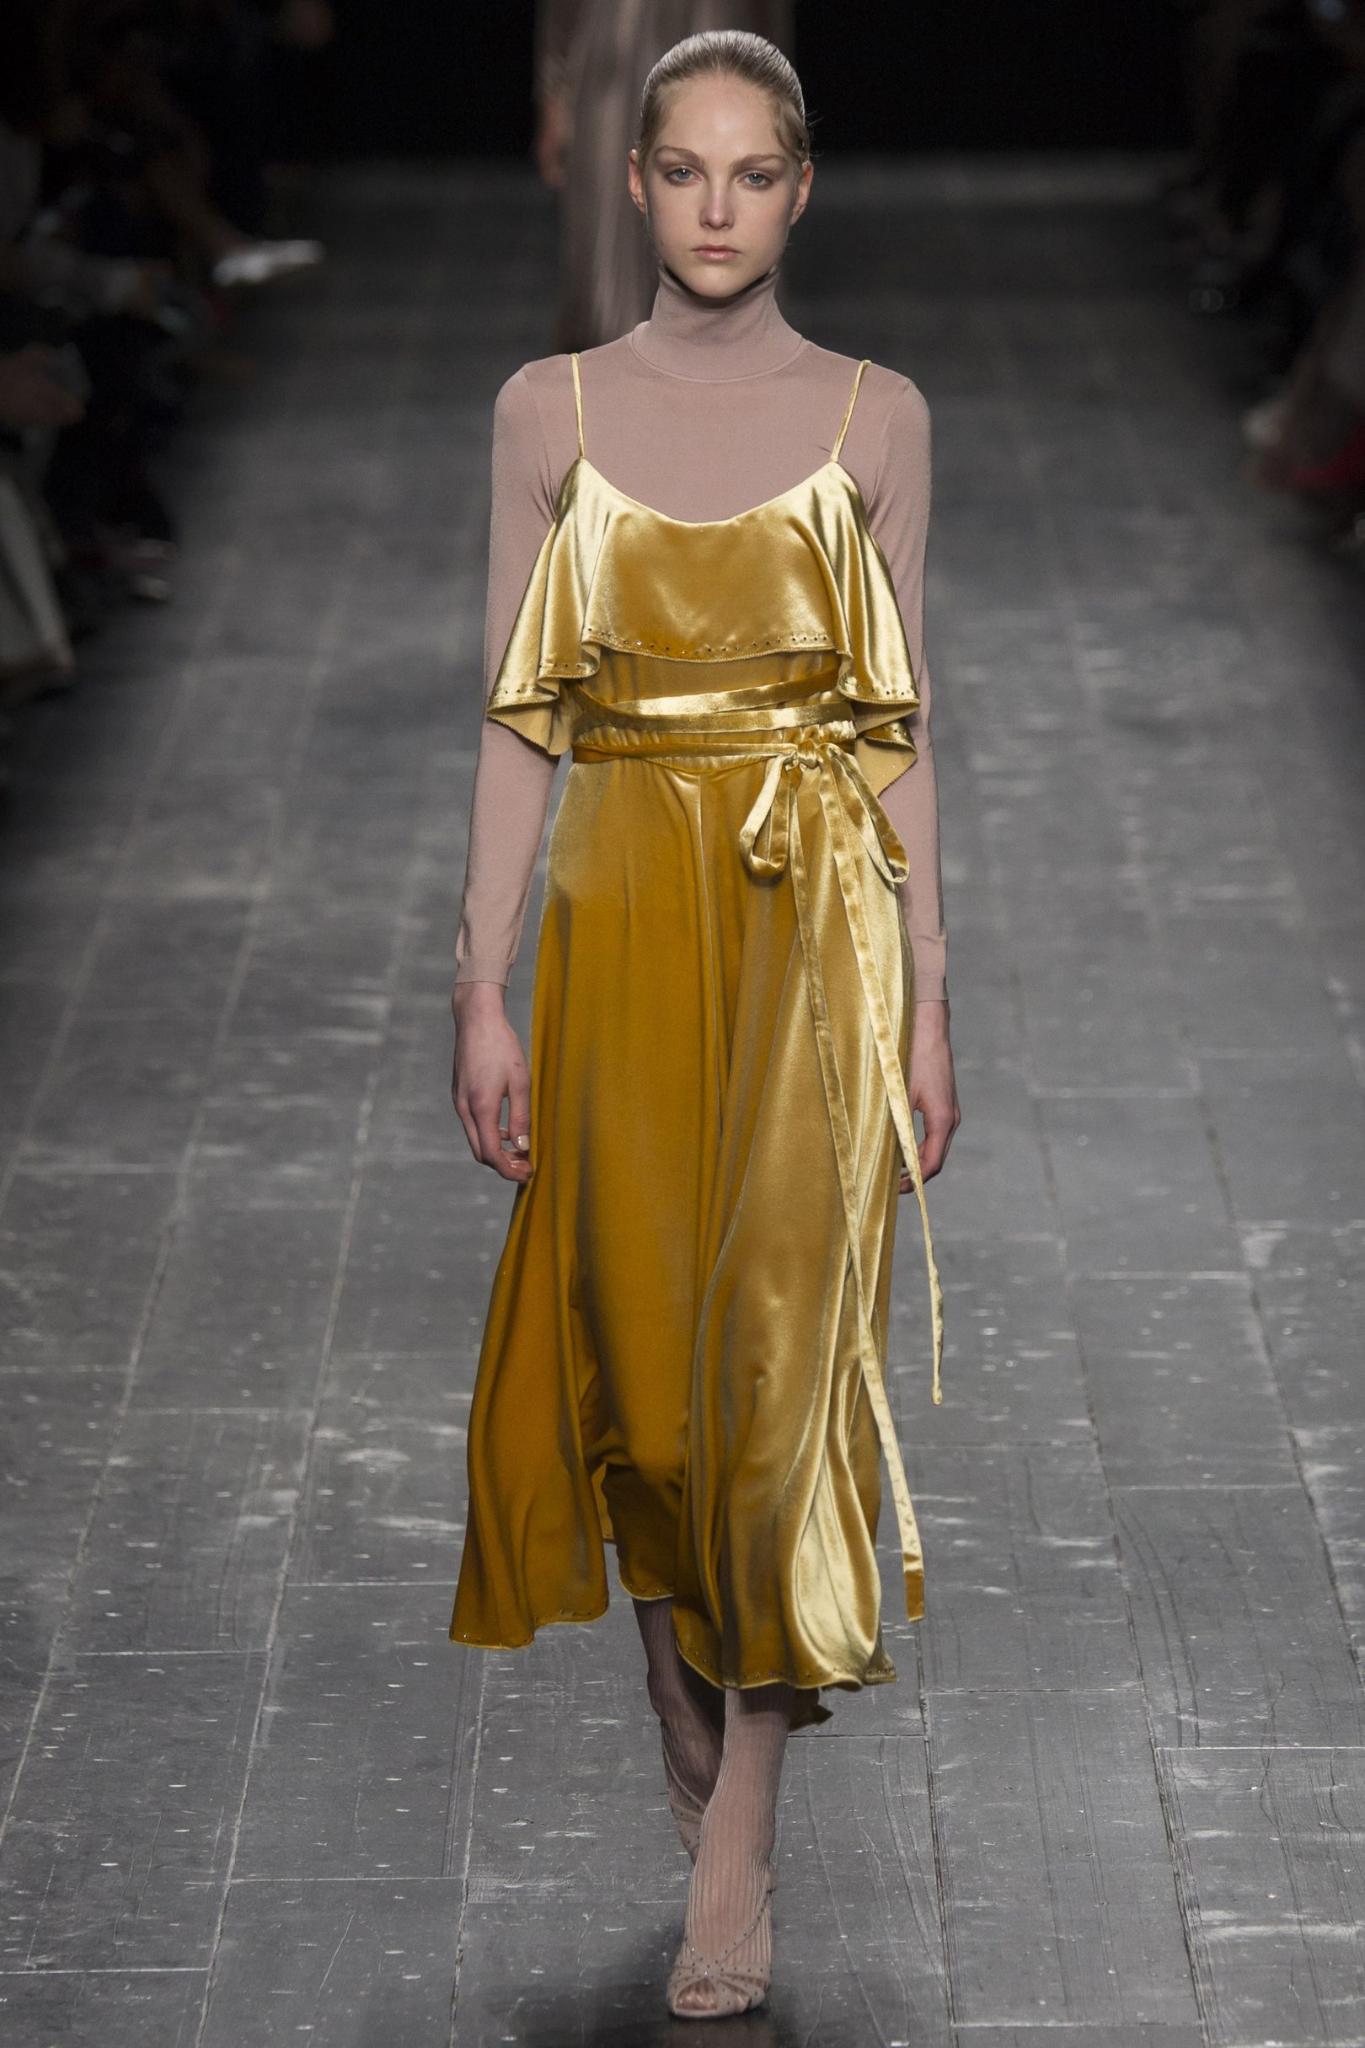 MOD-by-Monique-Fashion-Trend-Velvet-Valentino-1